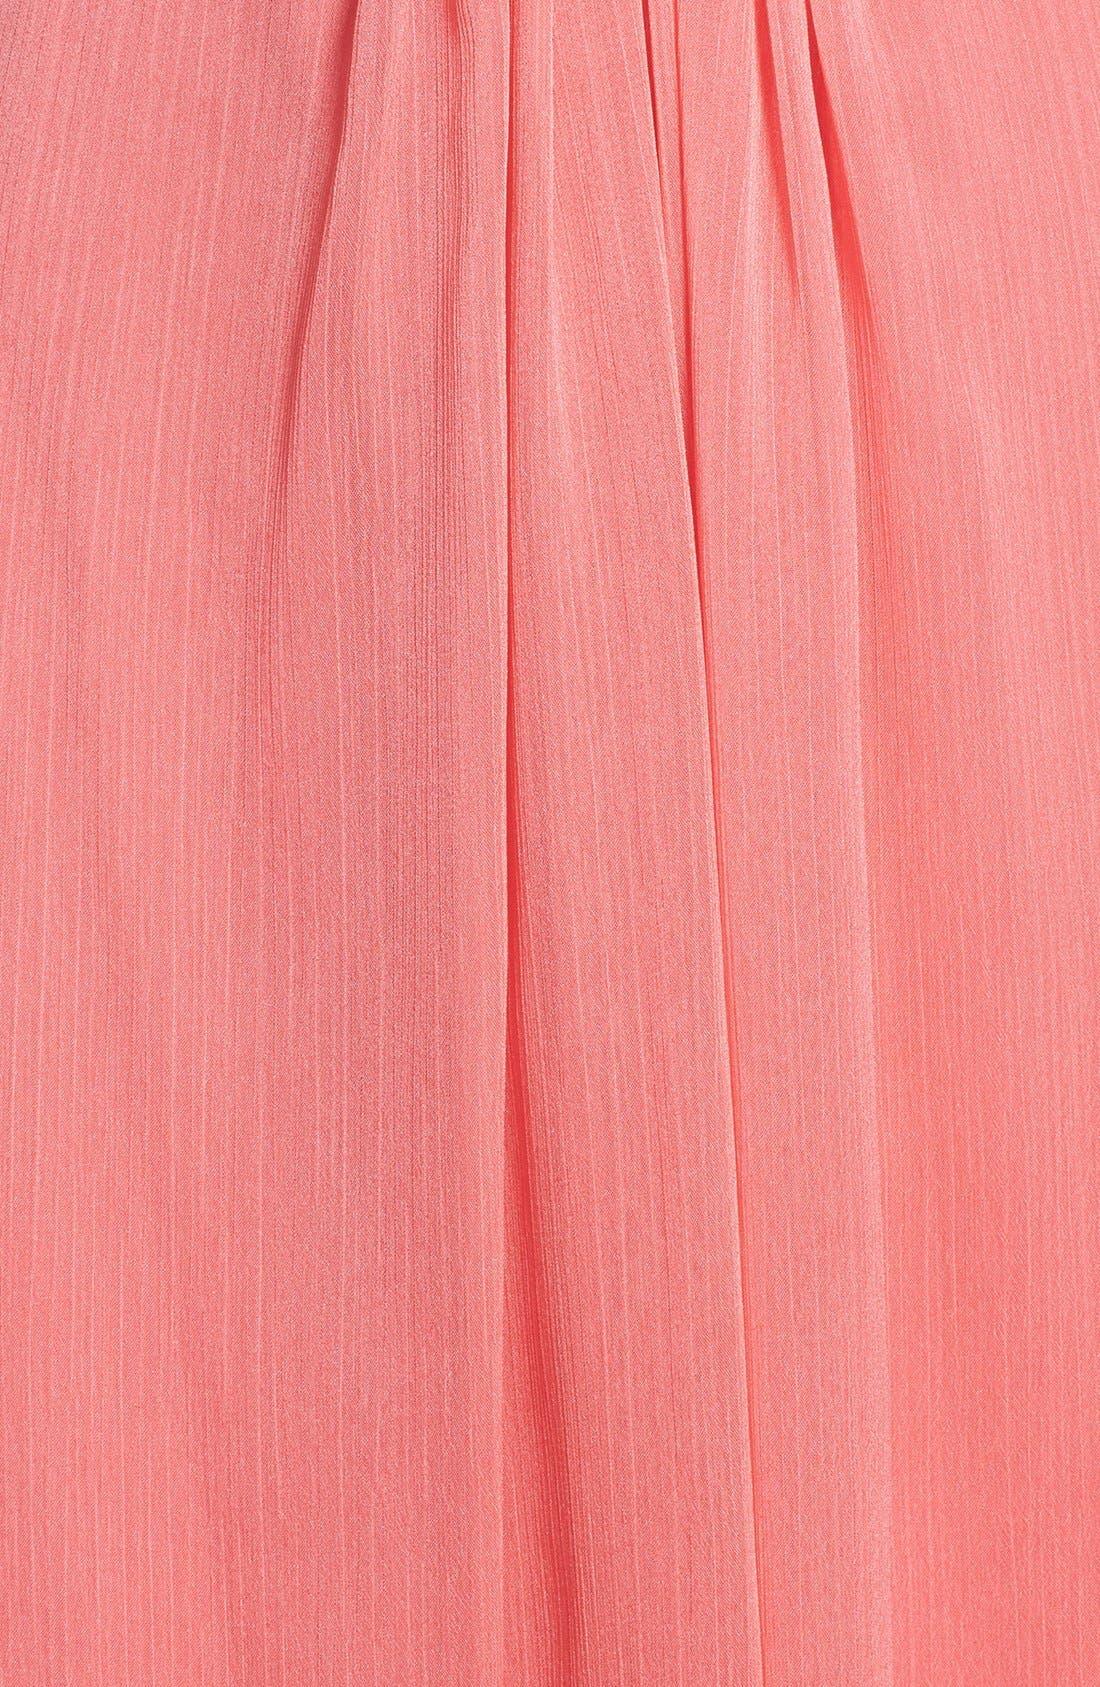 Alternate Image 3  - Aidan by Aidan Mattox Embellished Cutout Crinkled Chiffon Gown